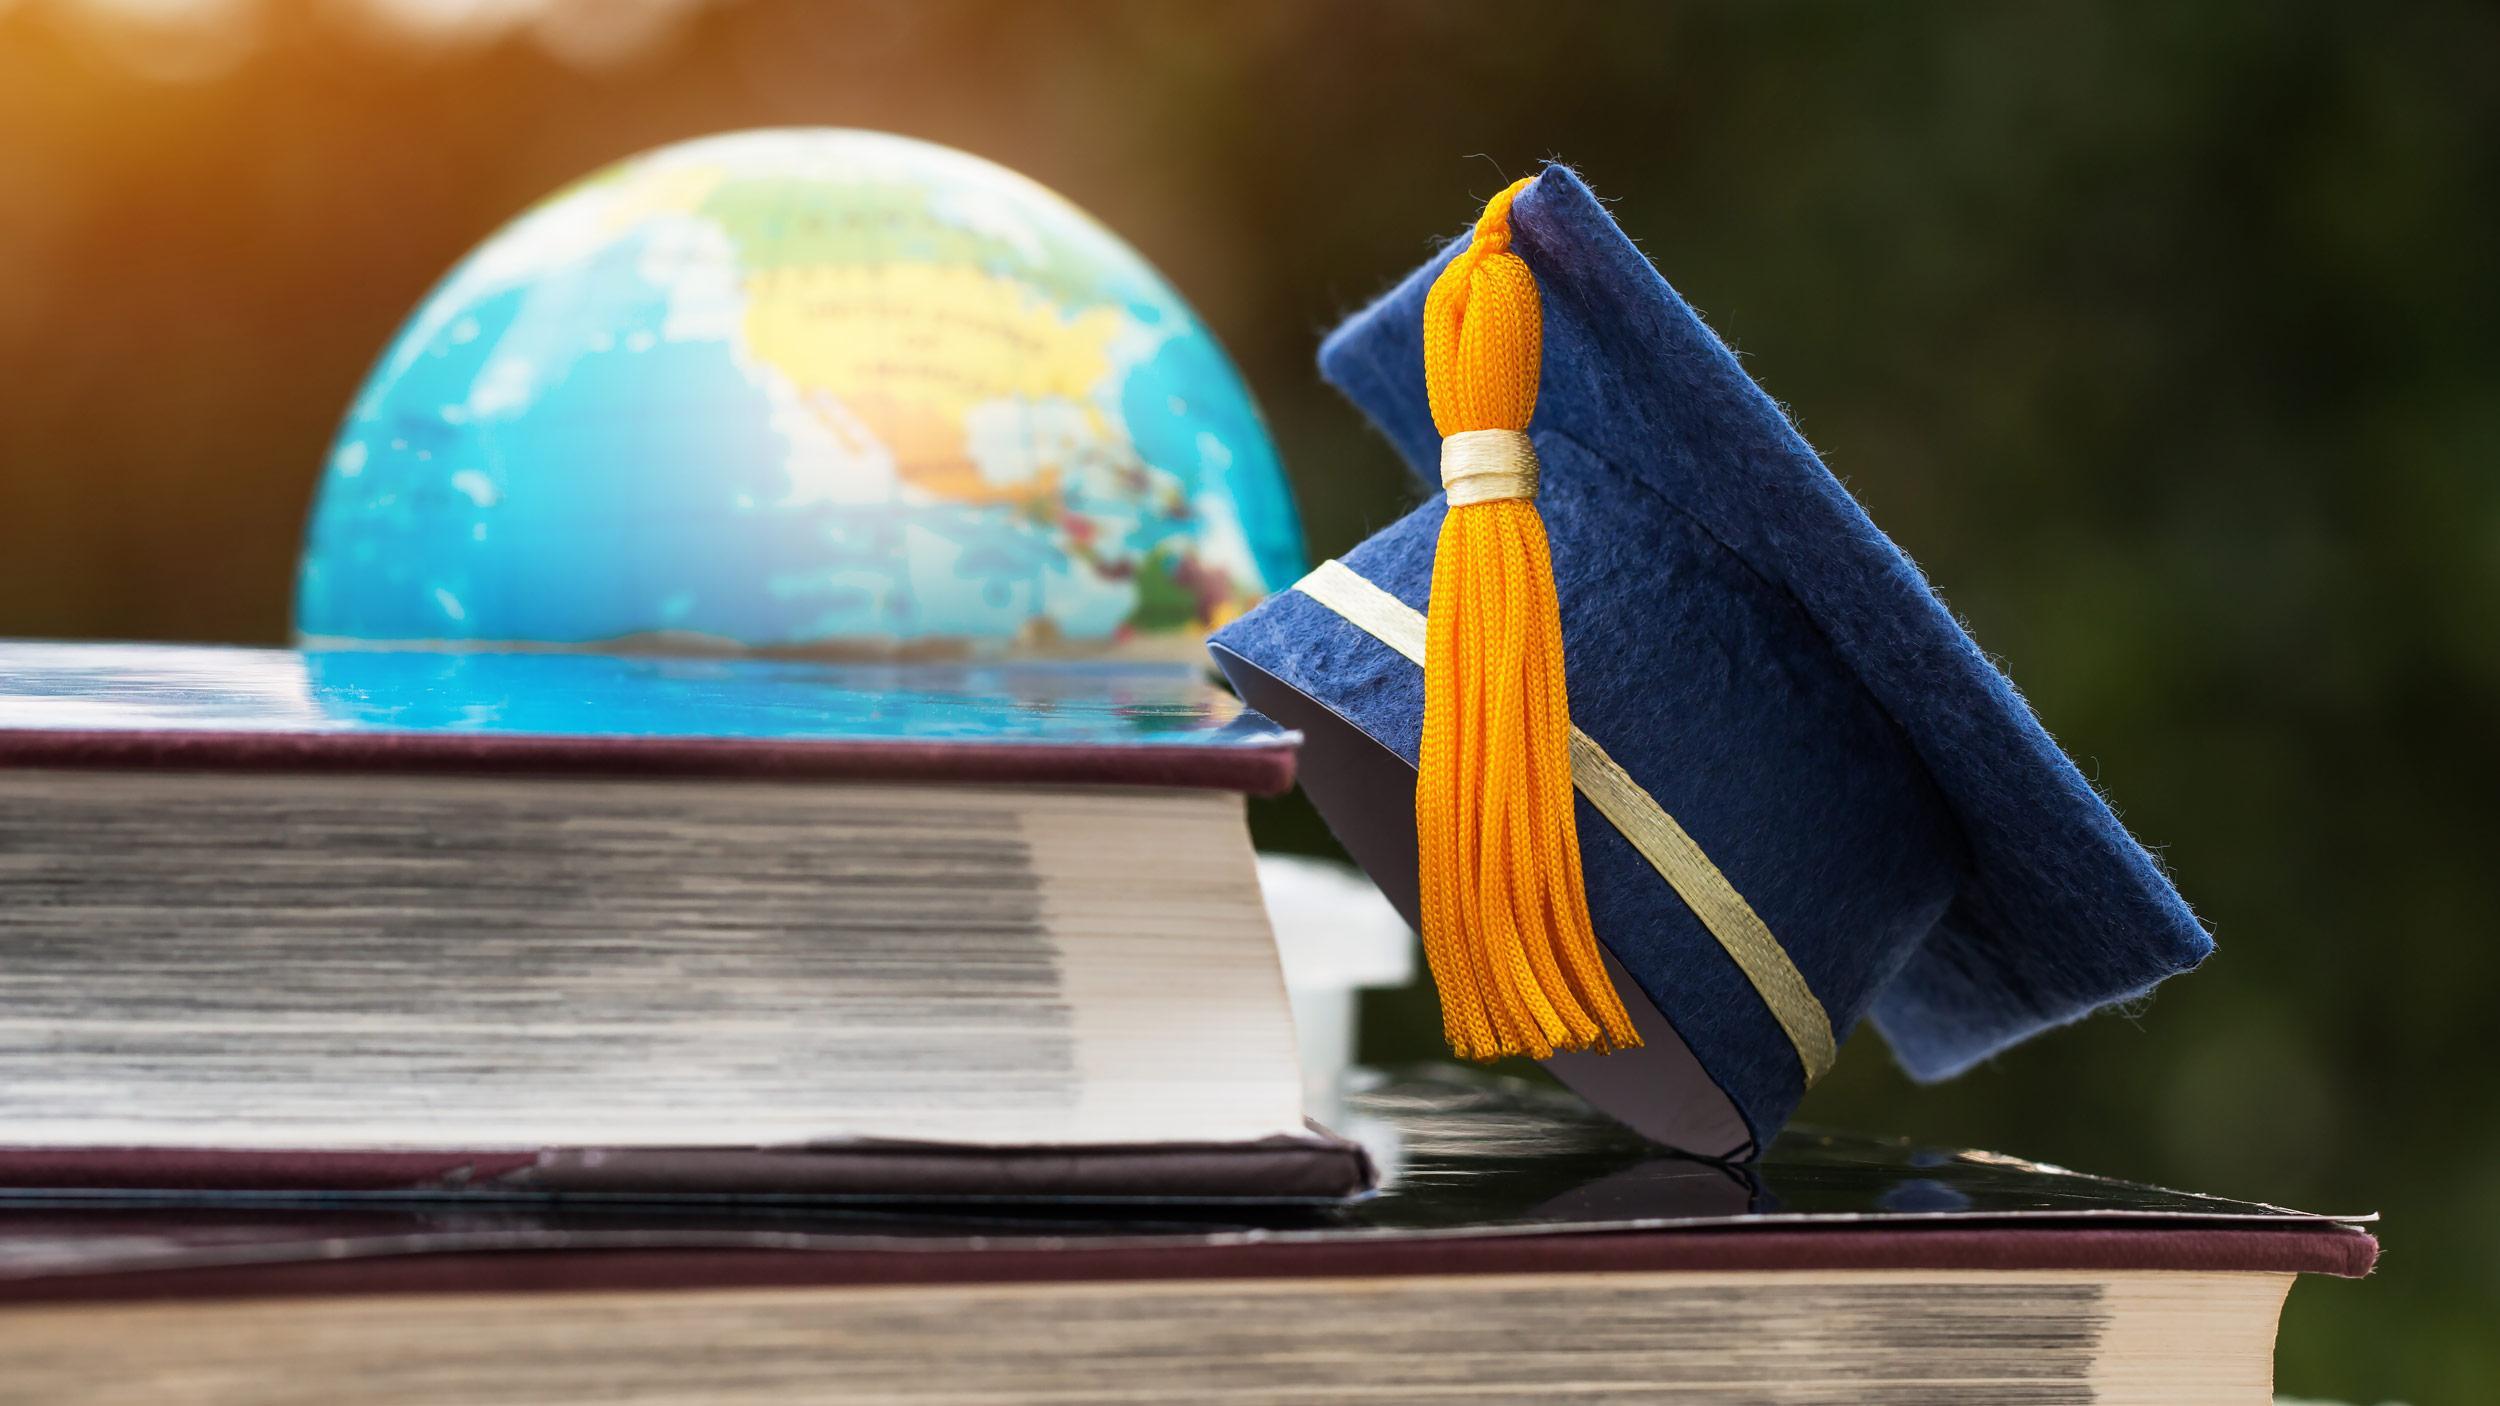 Kaplan International Colleges - Postgraduate pathways в Великобритании